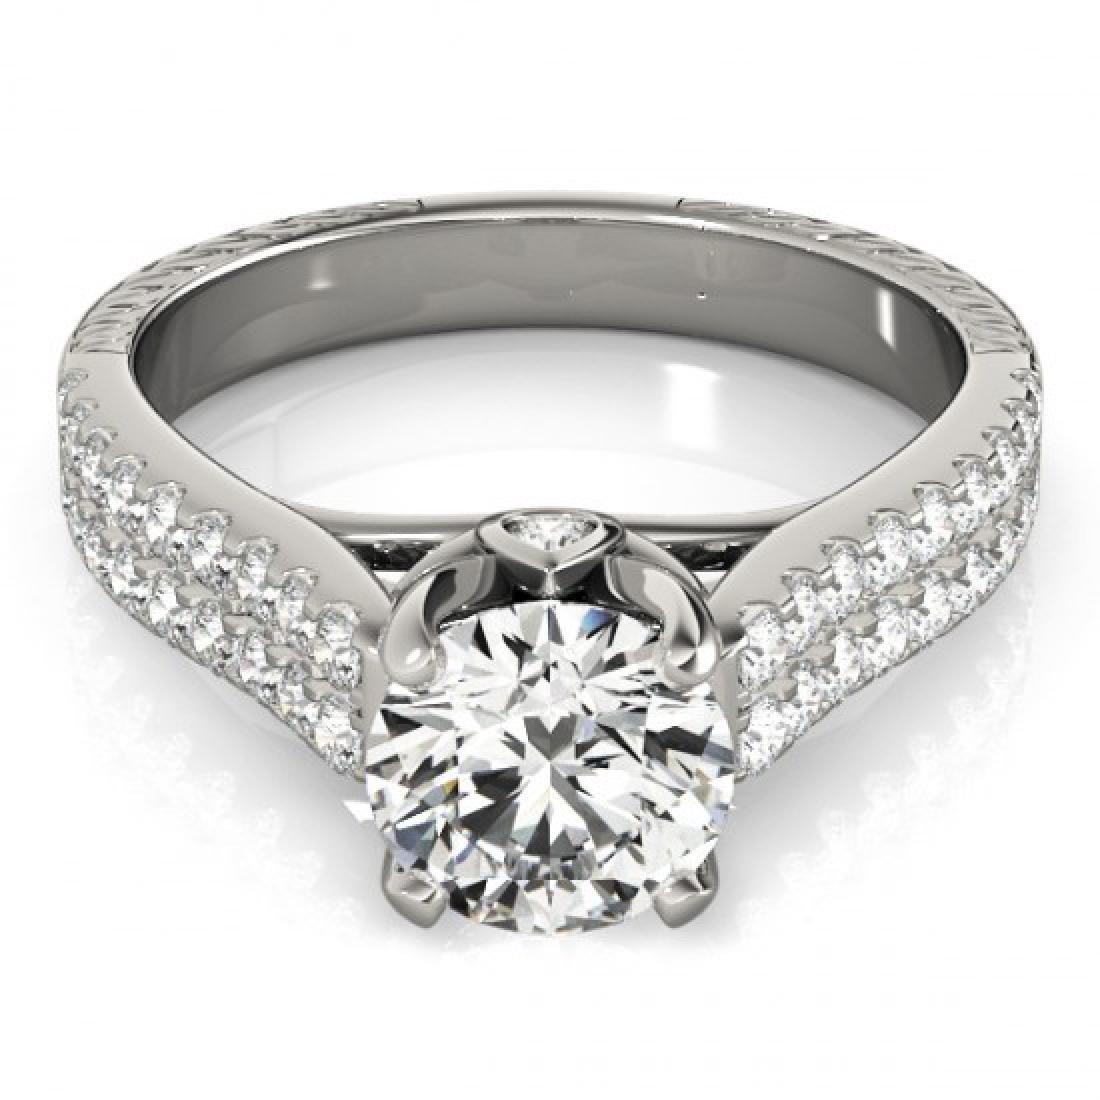 2.11 CTW Certified VS/SI Diamond Pave Ring 14K White